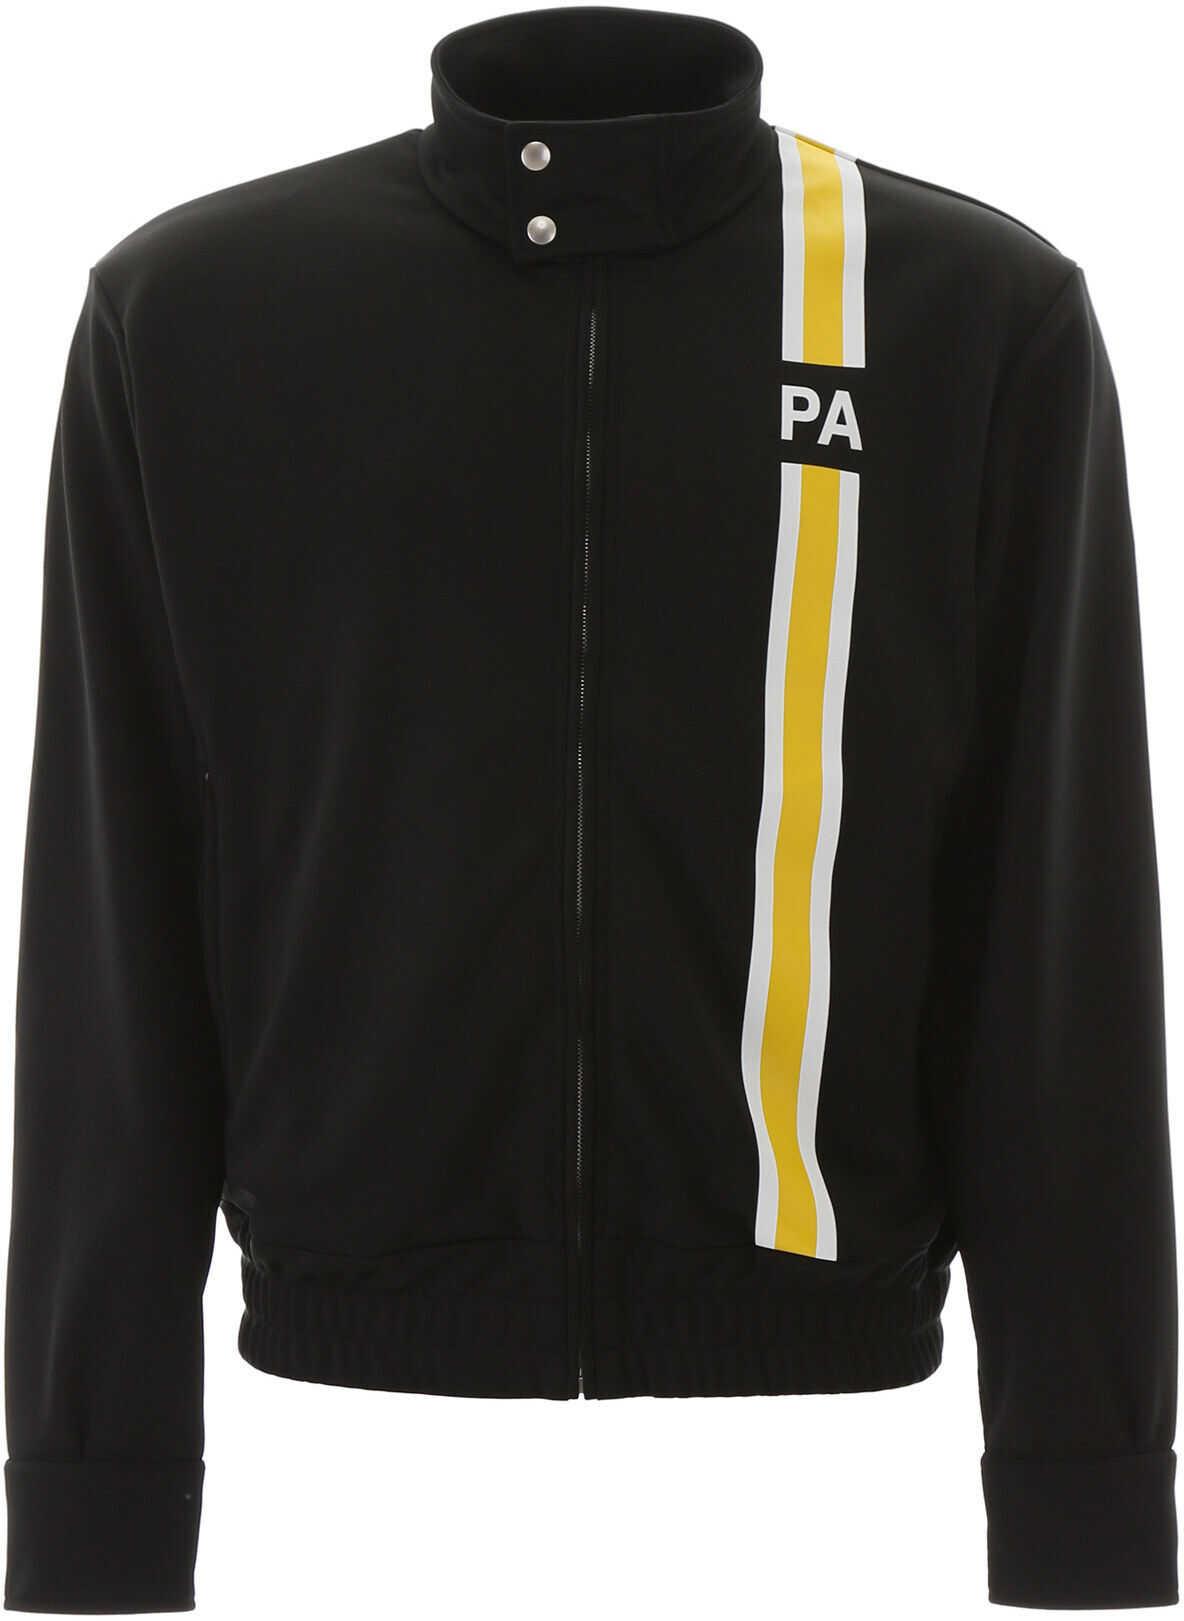 Palm Angels Zip-Up Sweatshirt With Initials BLACK YELLOW